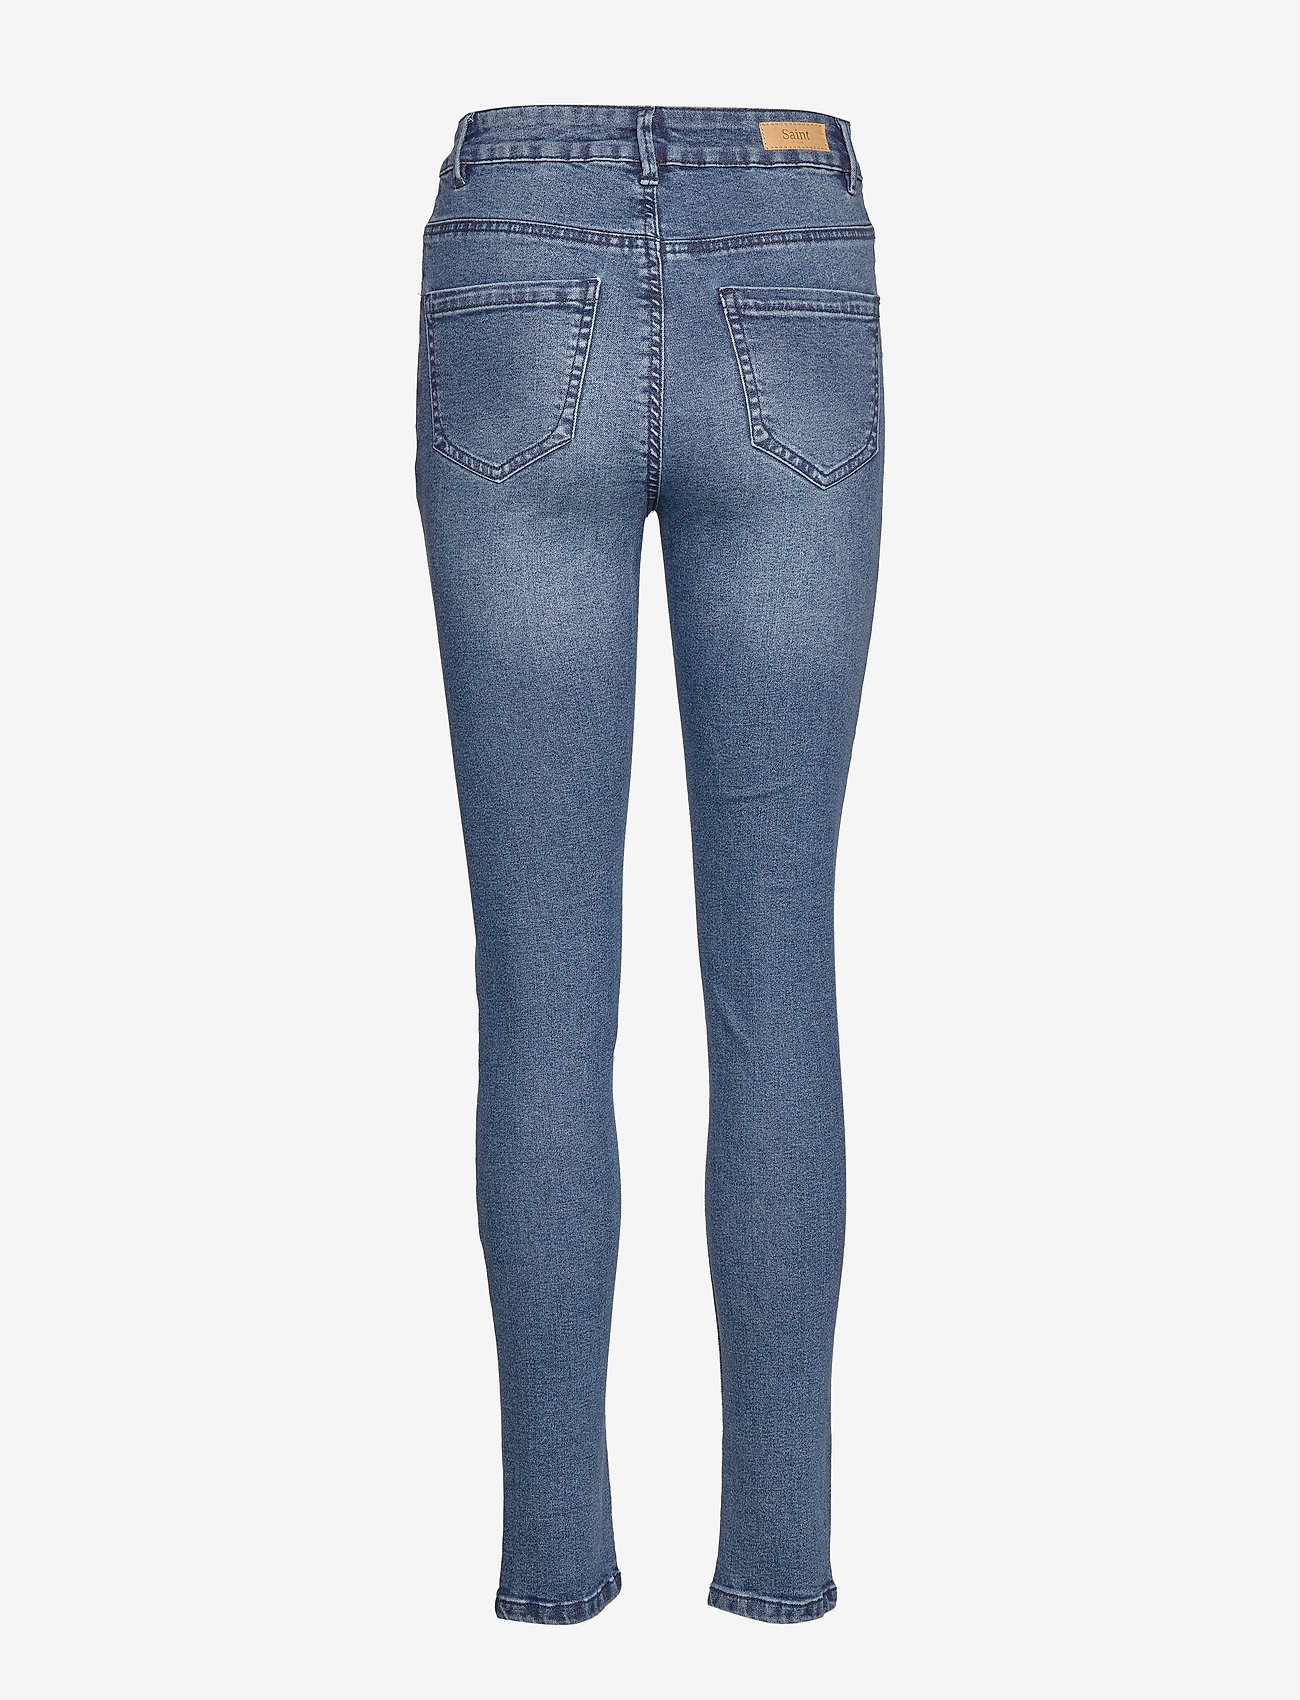 Saint Tropez - T5757, TinnaSZ Jeans - skinny jeans - med.blue - 2